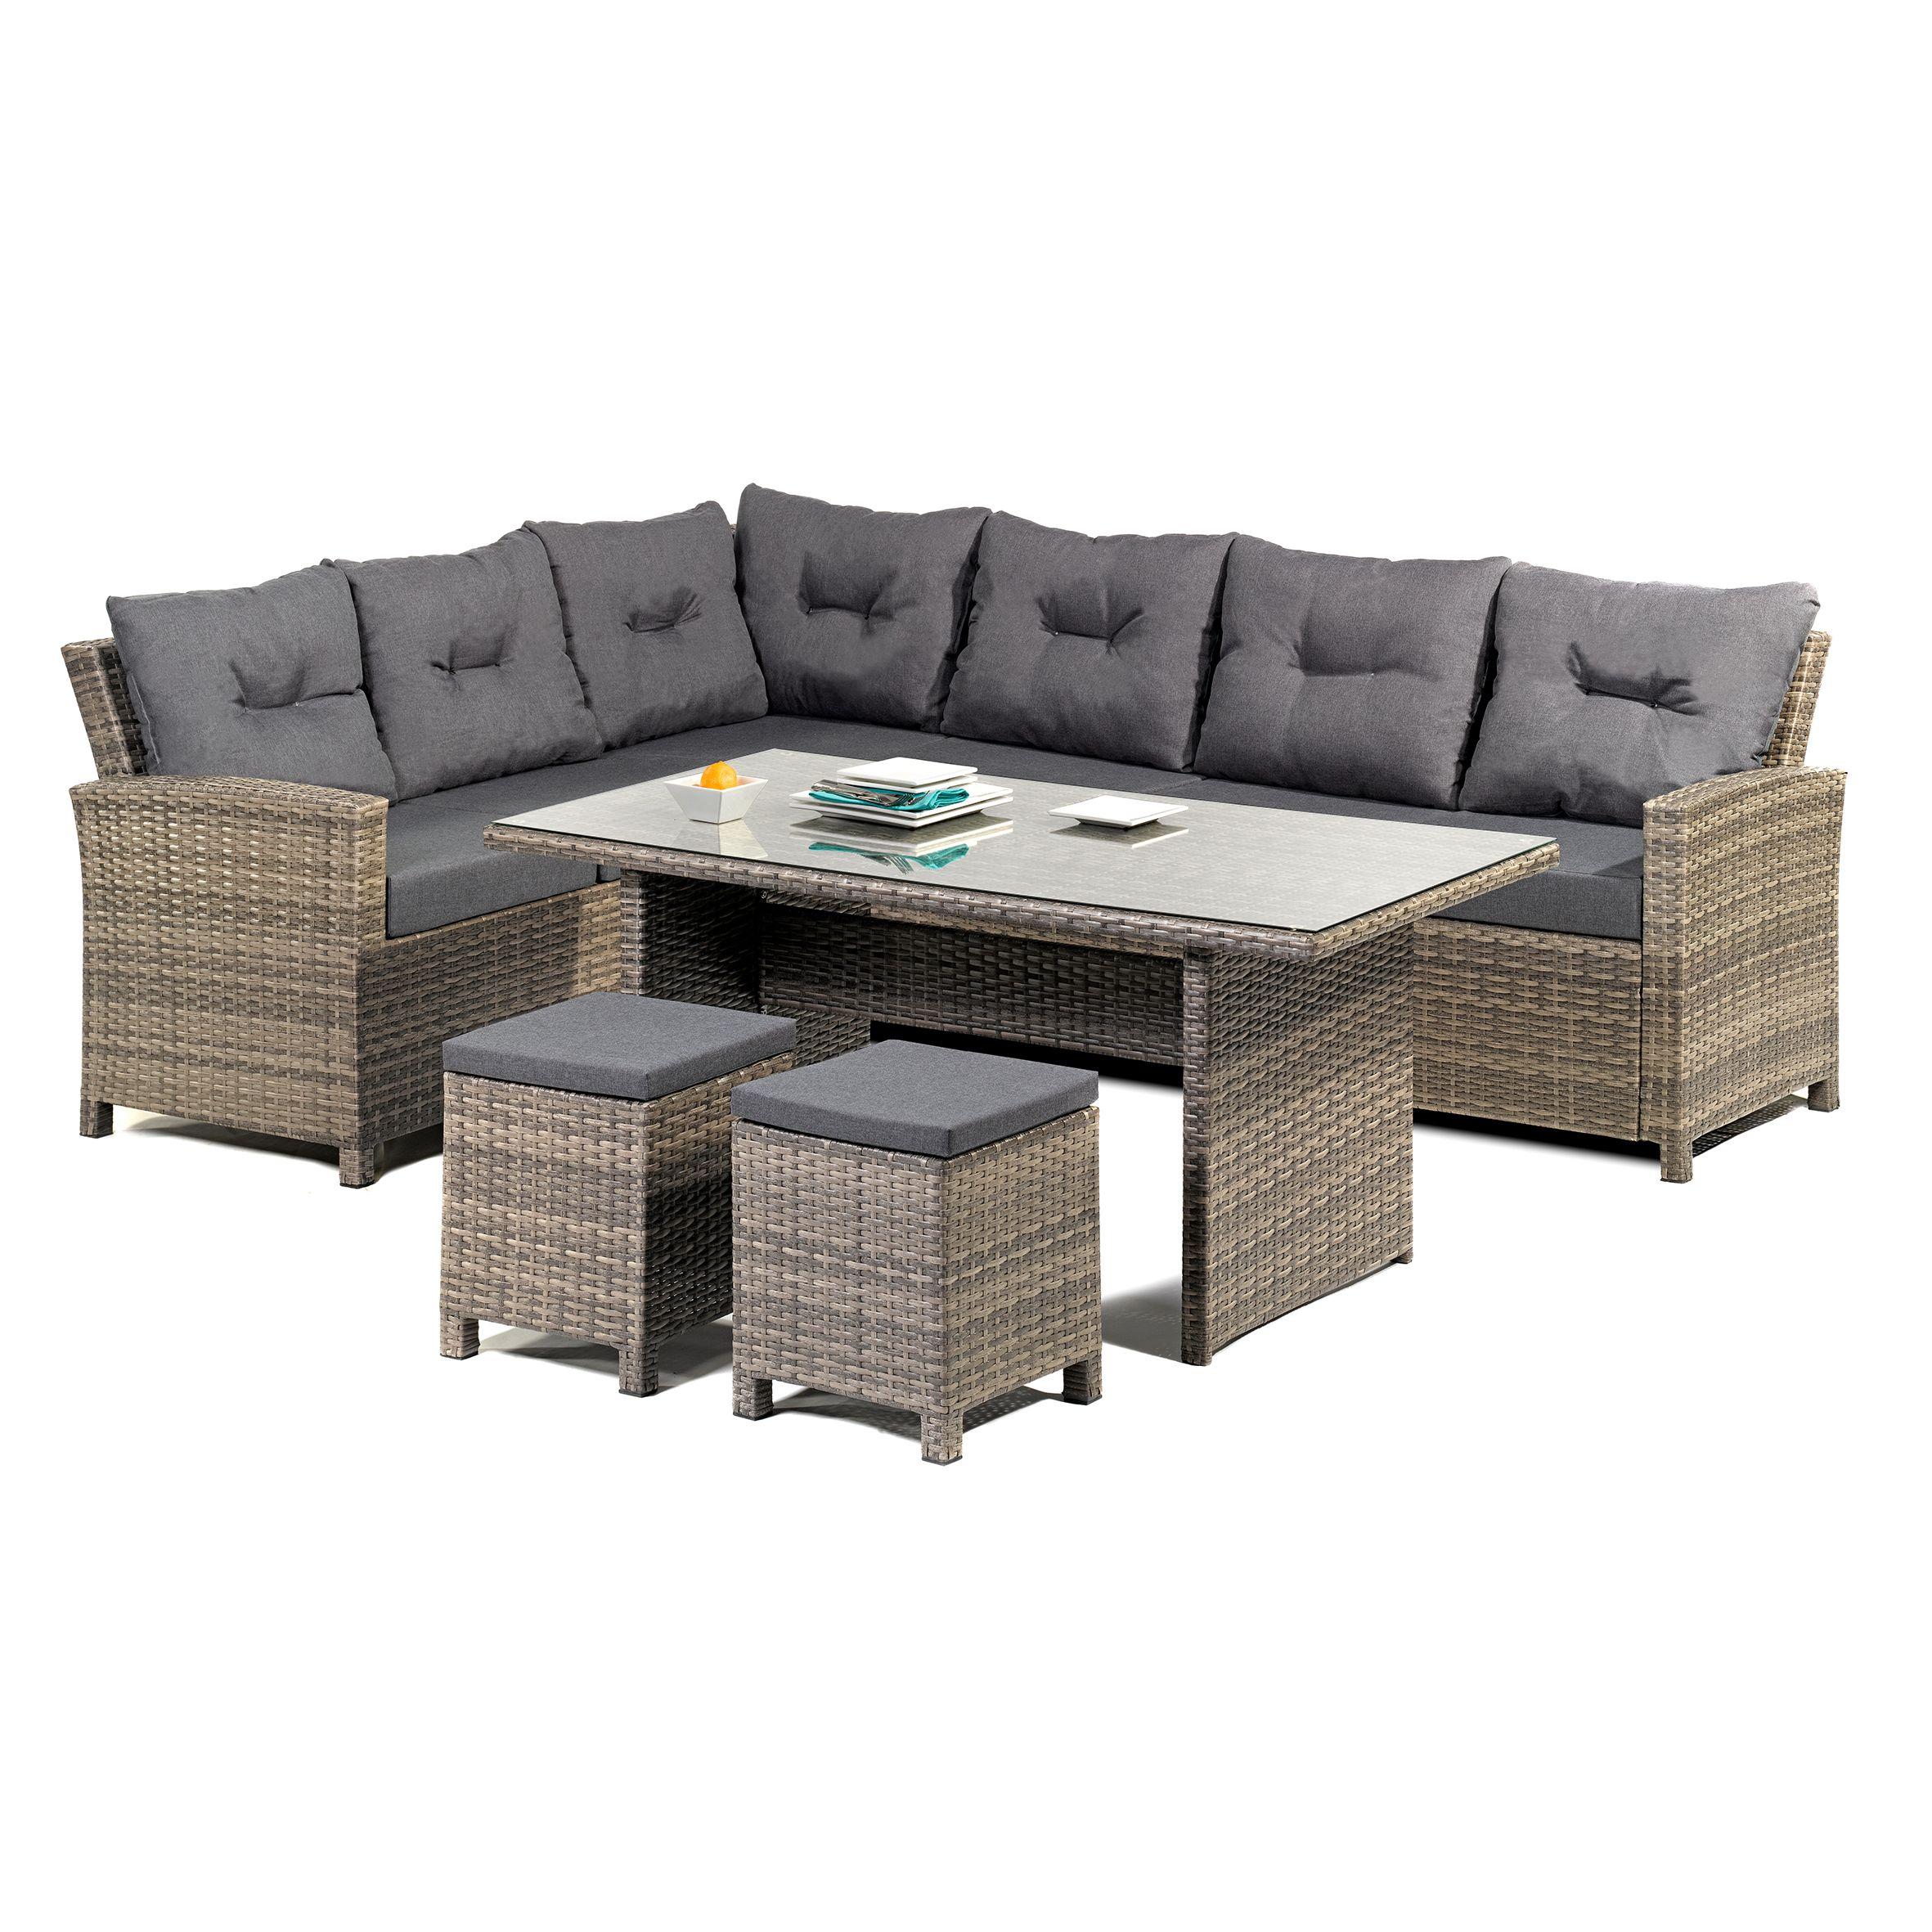 Lounge Set Melina Loungeset Gartenlounge Garten Sitzgruppe Tisch